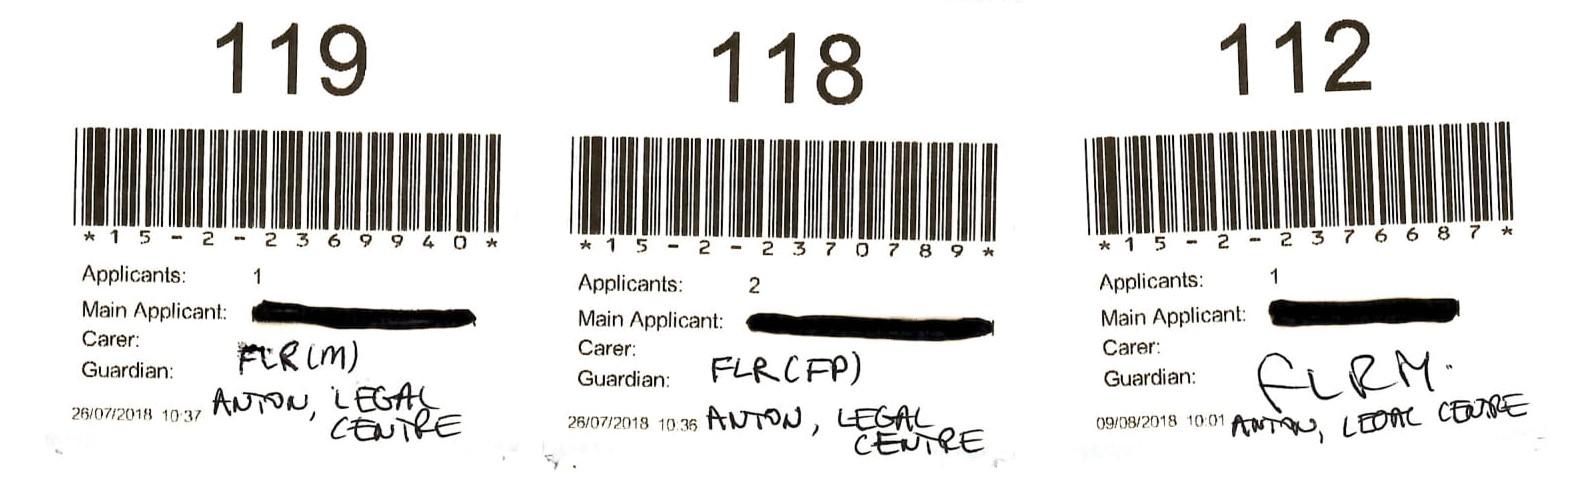 Legal_Centre_PSC_Applications_FLRM_FLRFM_best_immigration_lawyers_UK_www.legalcentre.org_07791145923.jpg